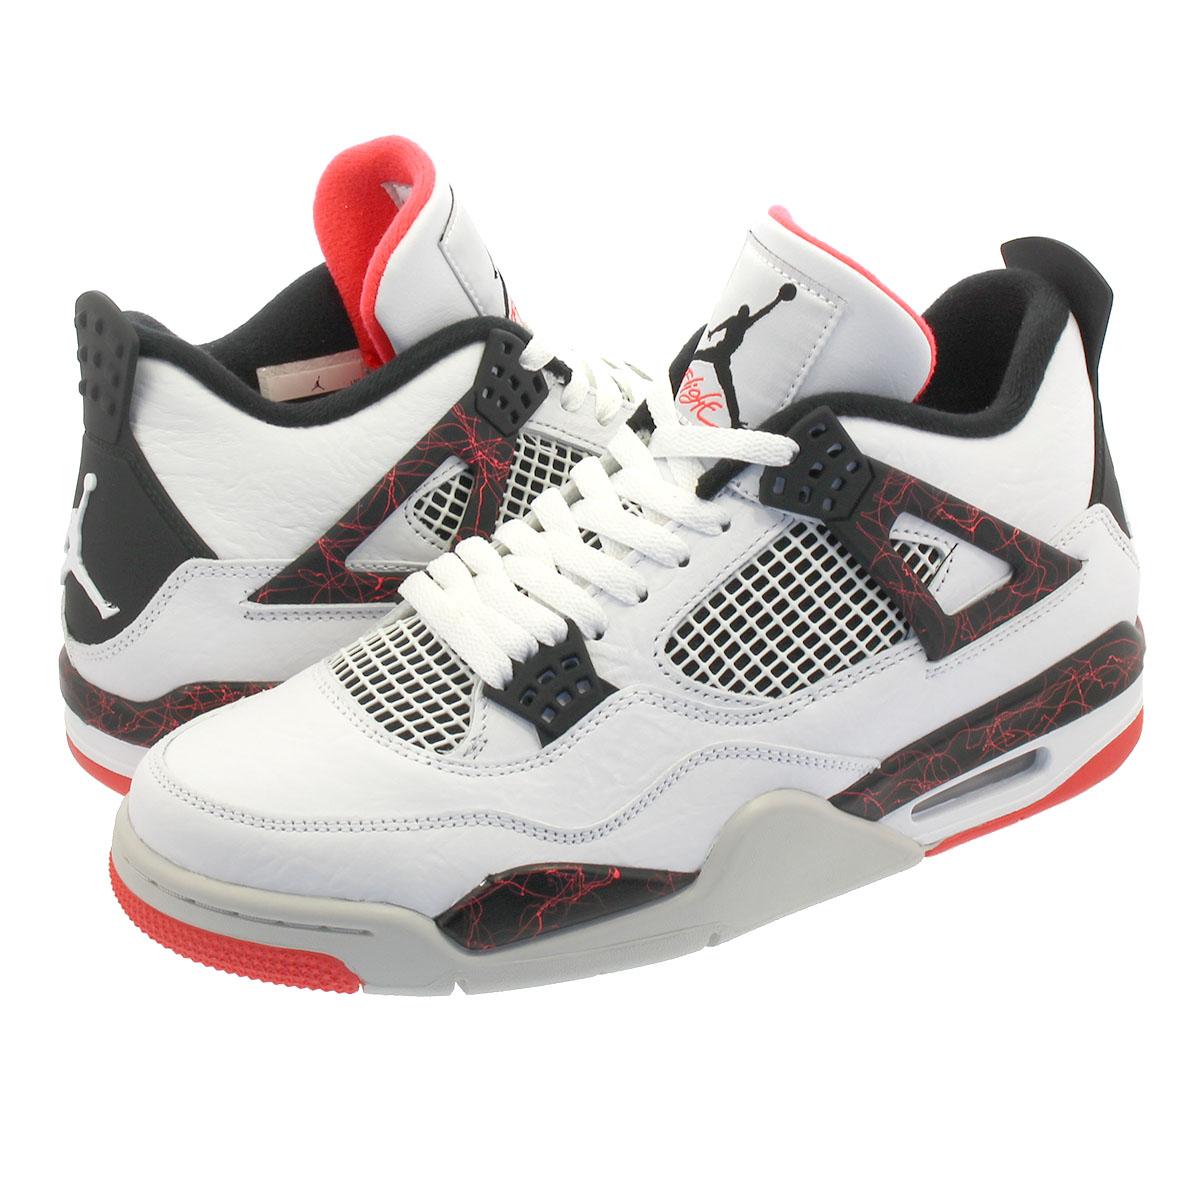 official photos 12e01 0ce27 NIKE AIR JORDAN 4 RETRO Nike air Jordan 4 nostalgic WHITE BLACK LIGHT  CRIMSON PALE CITRON 308,497-116